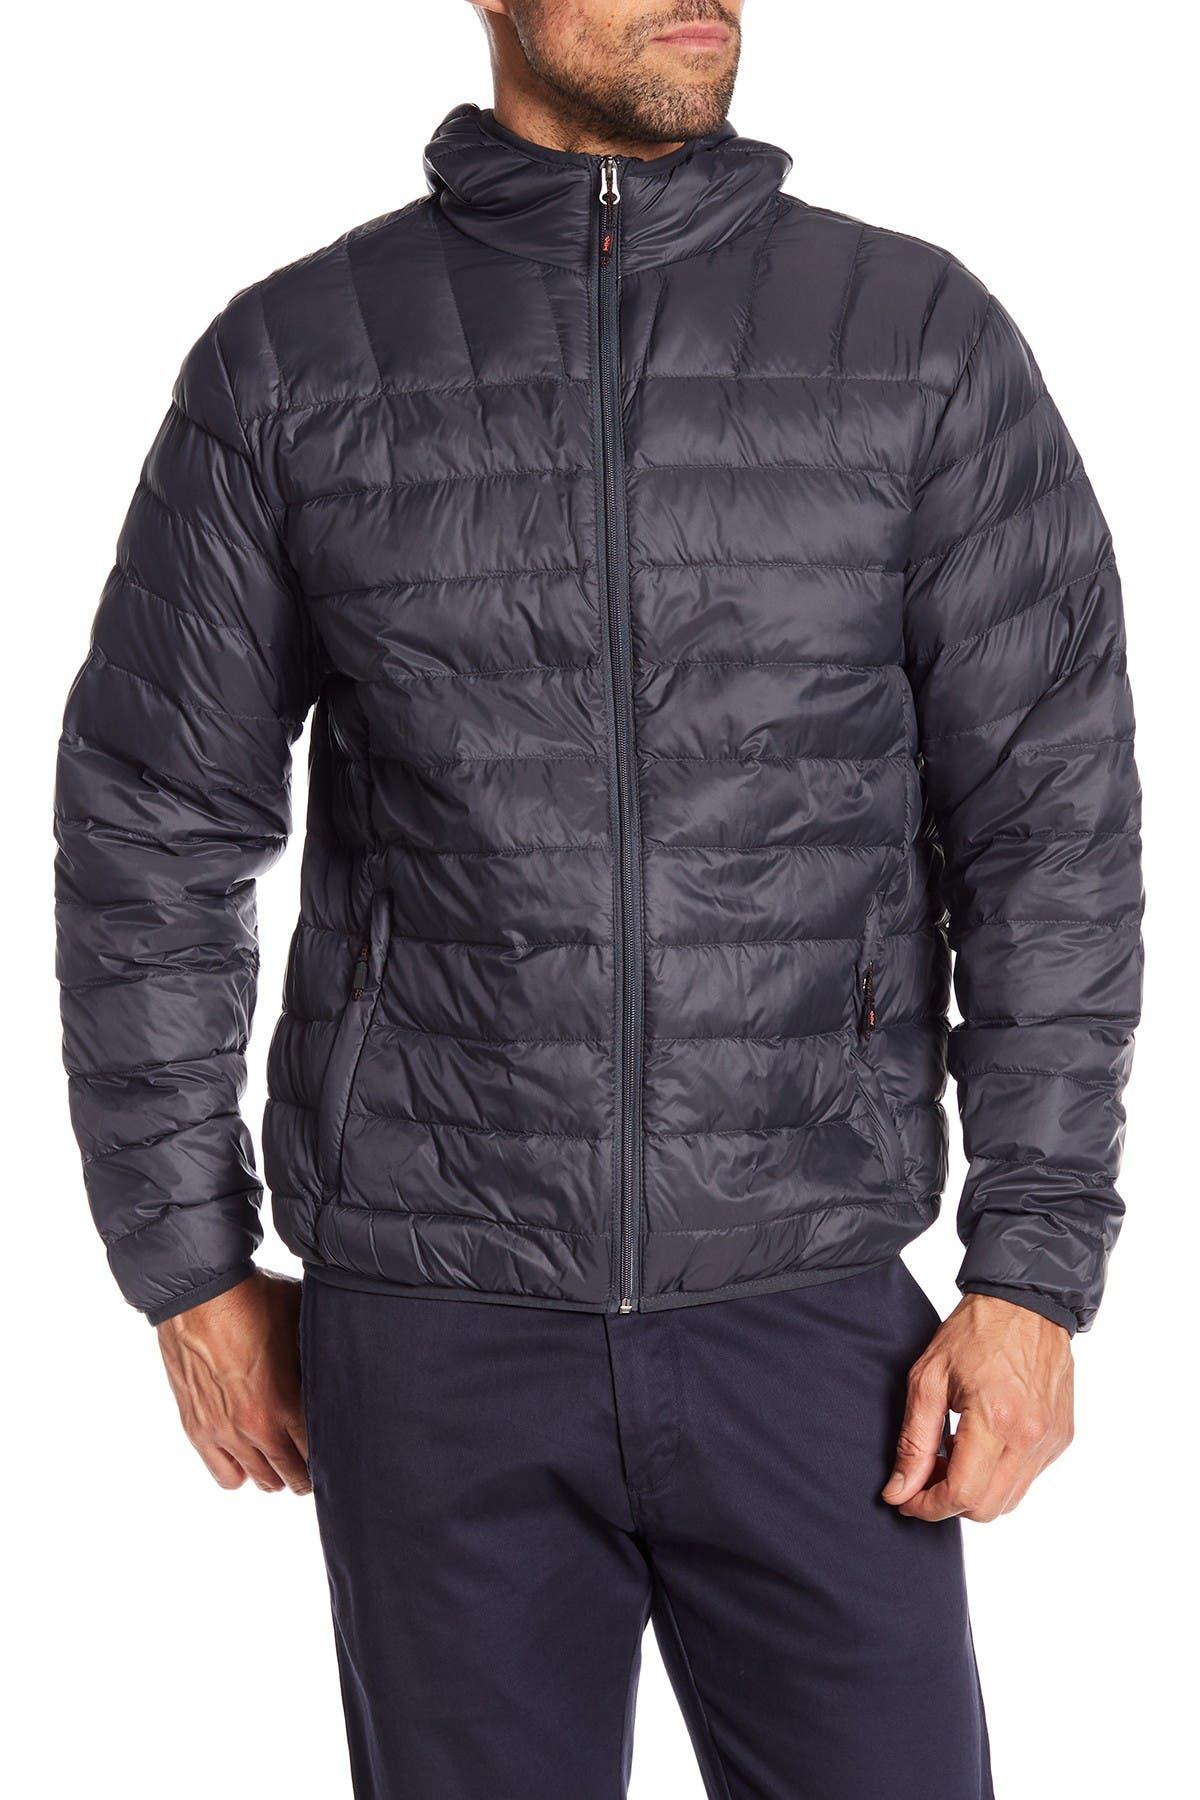 $295 Hawke /& Co Brown Winter Coat Parka Water /& Wind Resistant